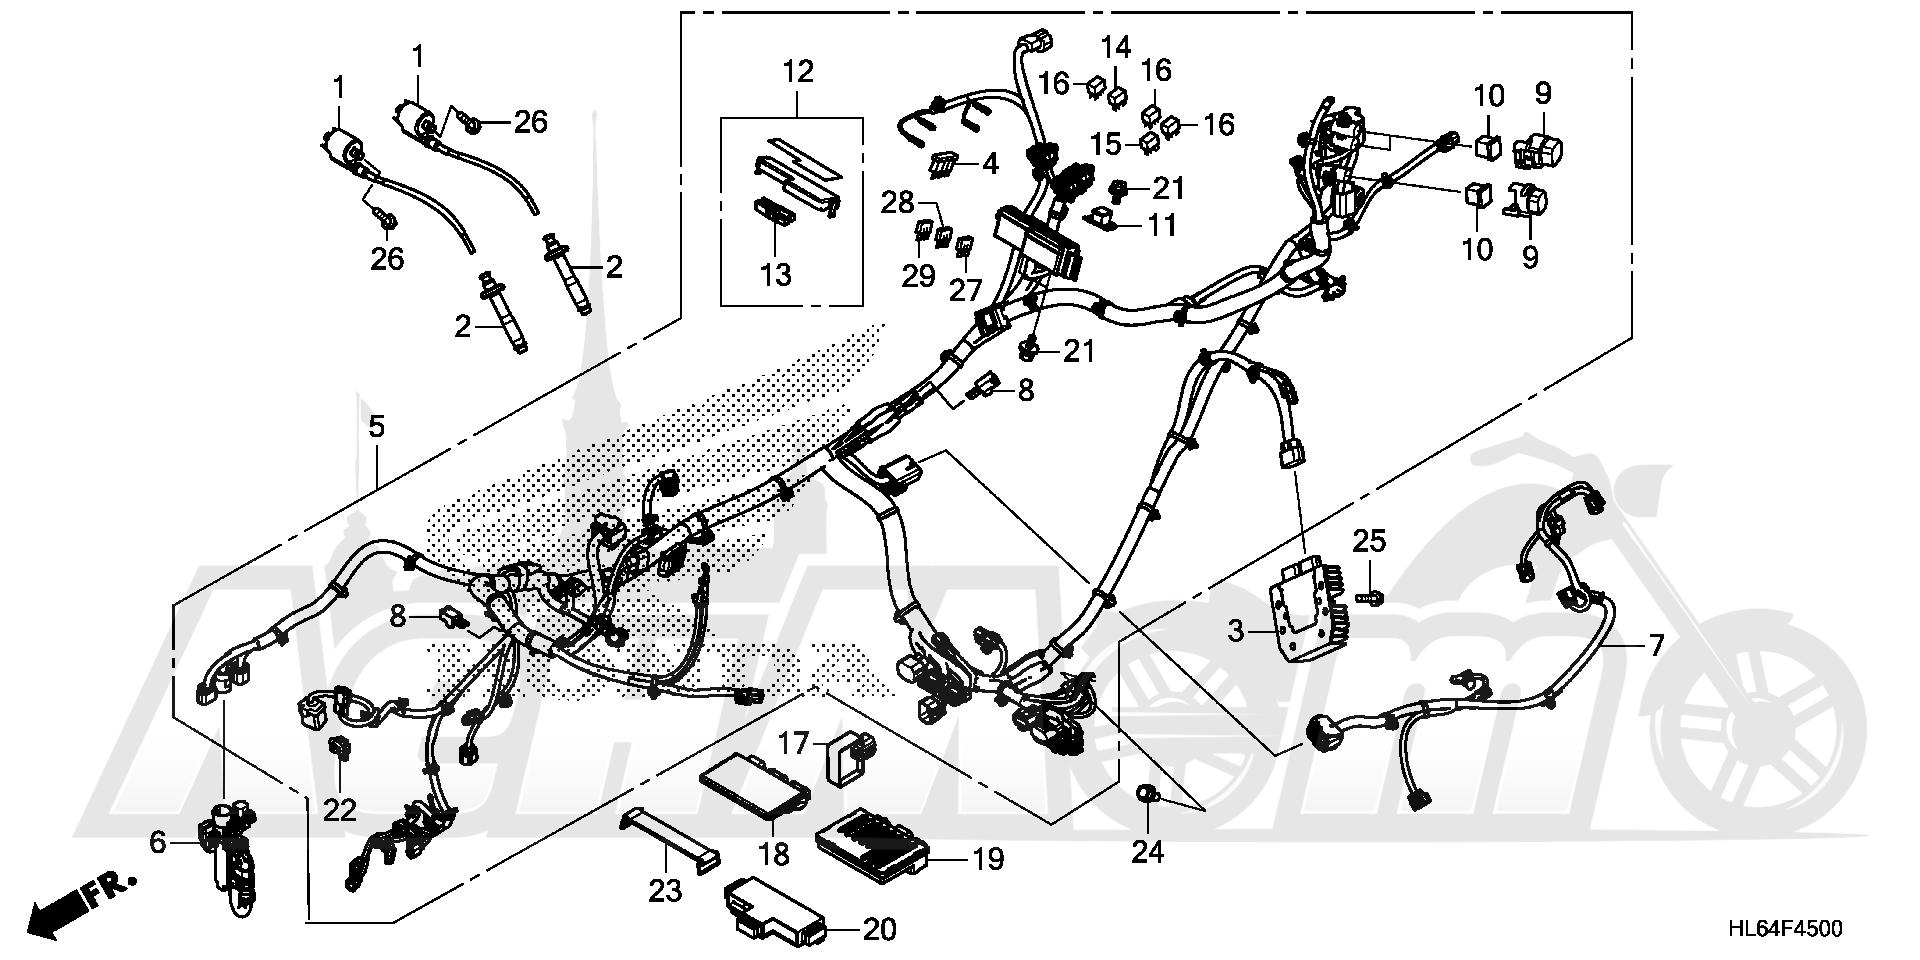 Запчасти для Квадроцикла Honda 2019 SXS1000S2R Раздел: WIRE HARNESS | жгут проводов